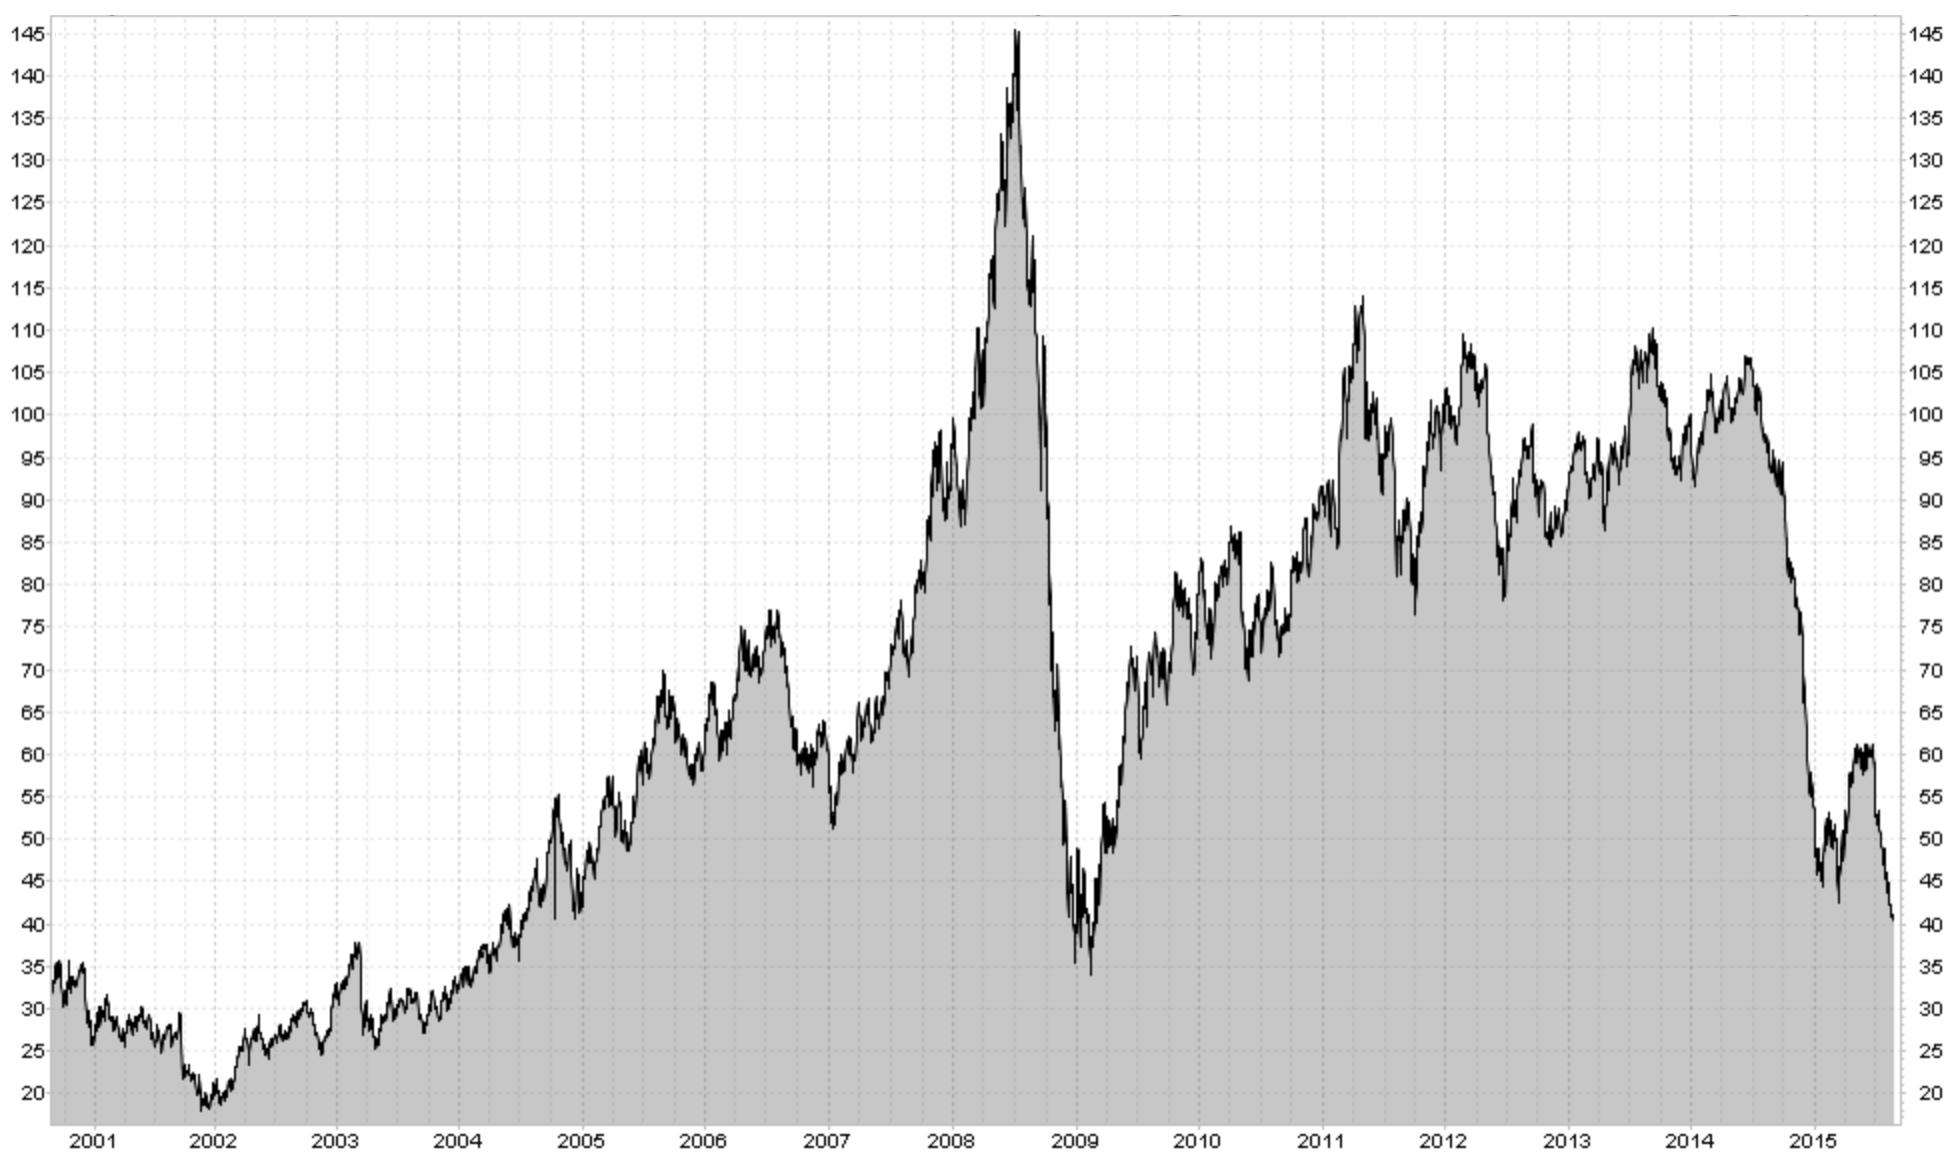 WEST TEXAS INTERMEDIATE (USD/BARREL)